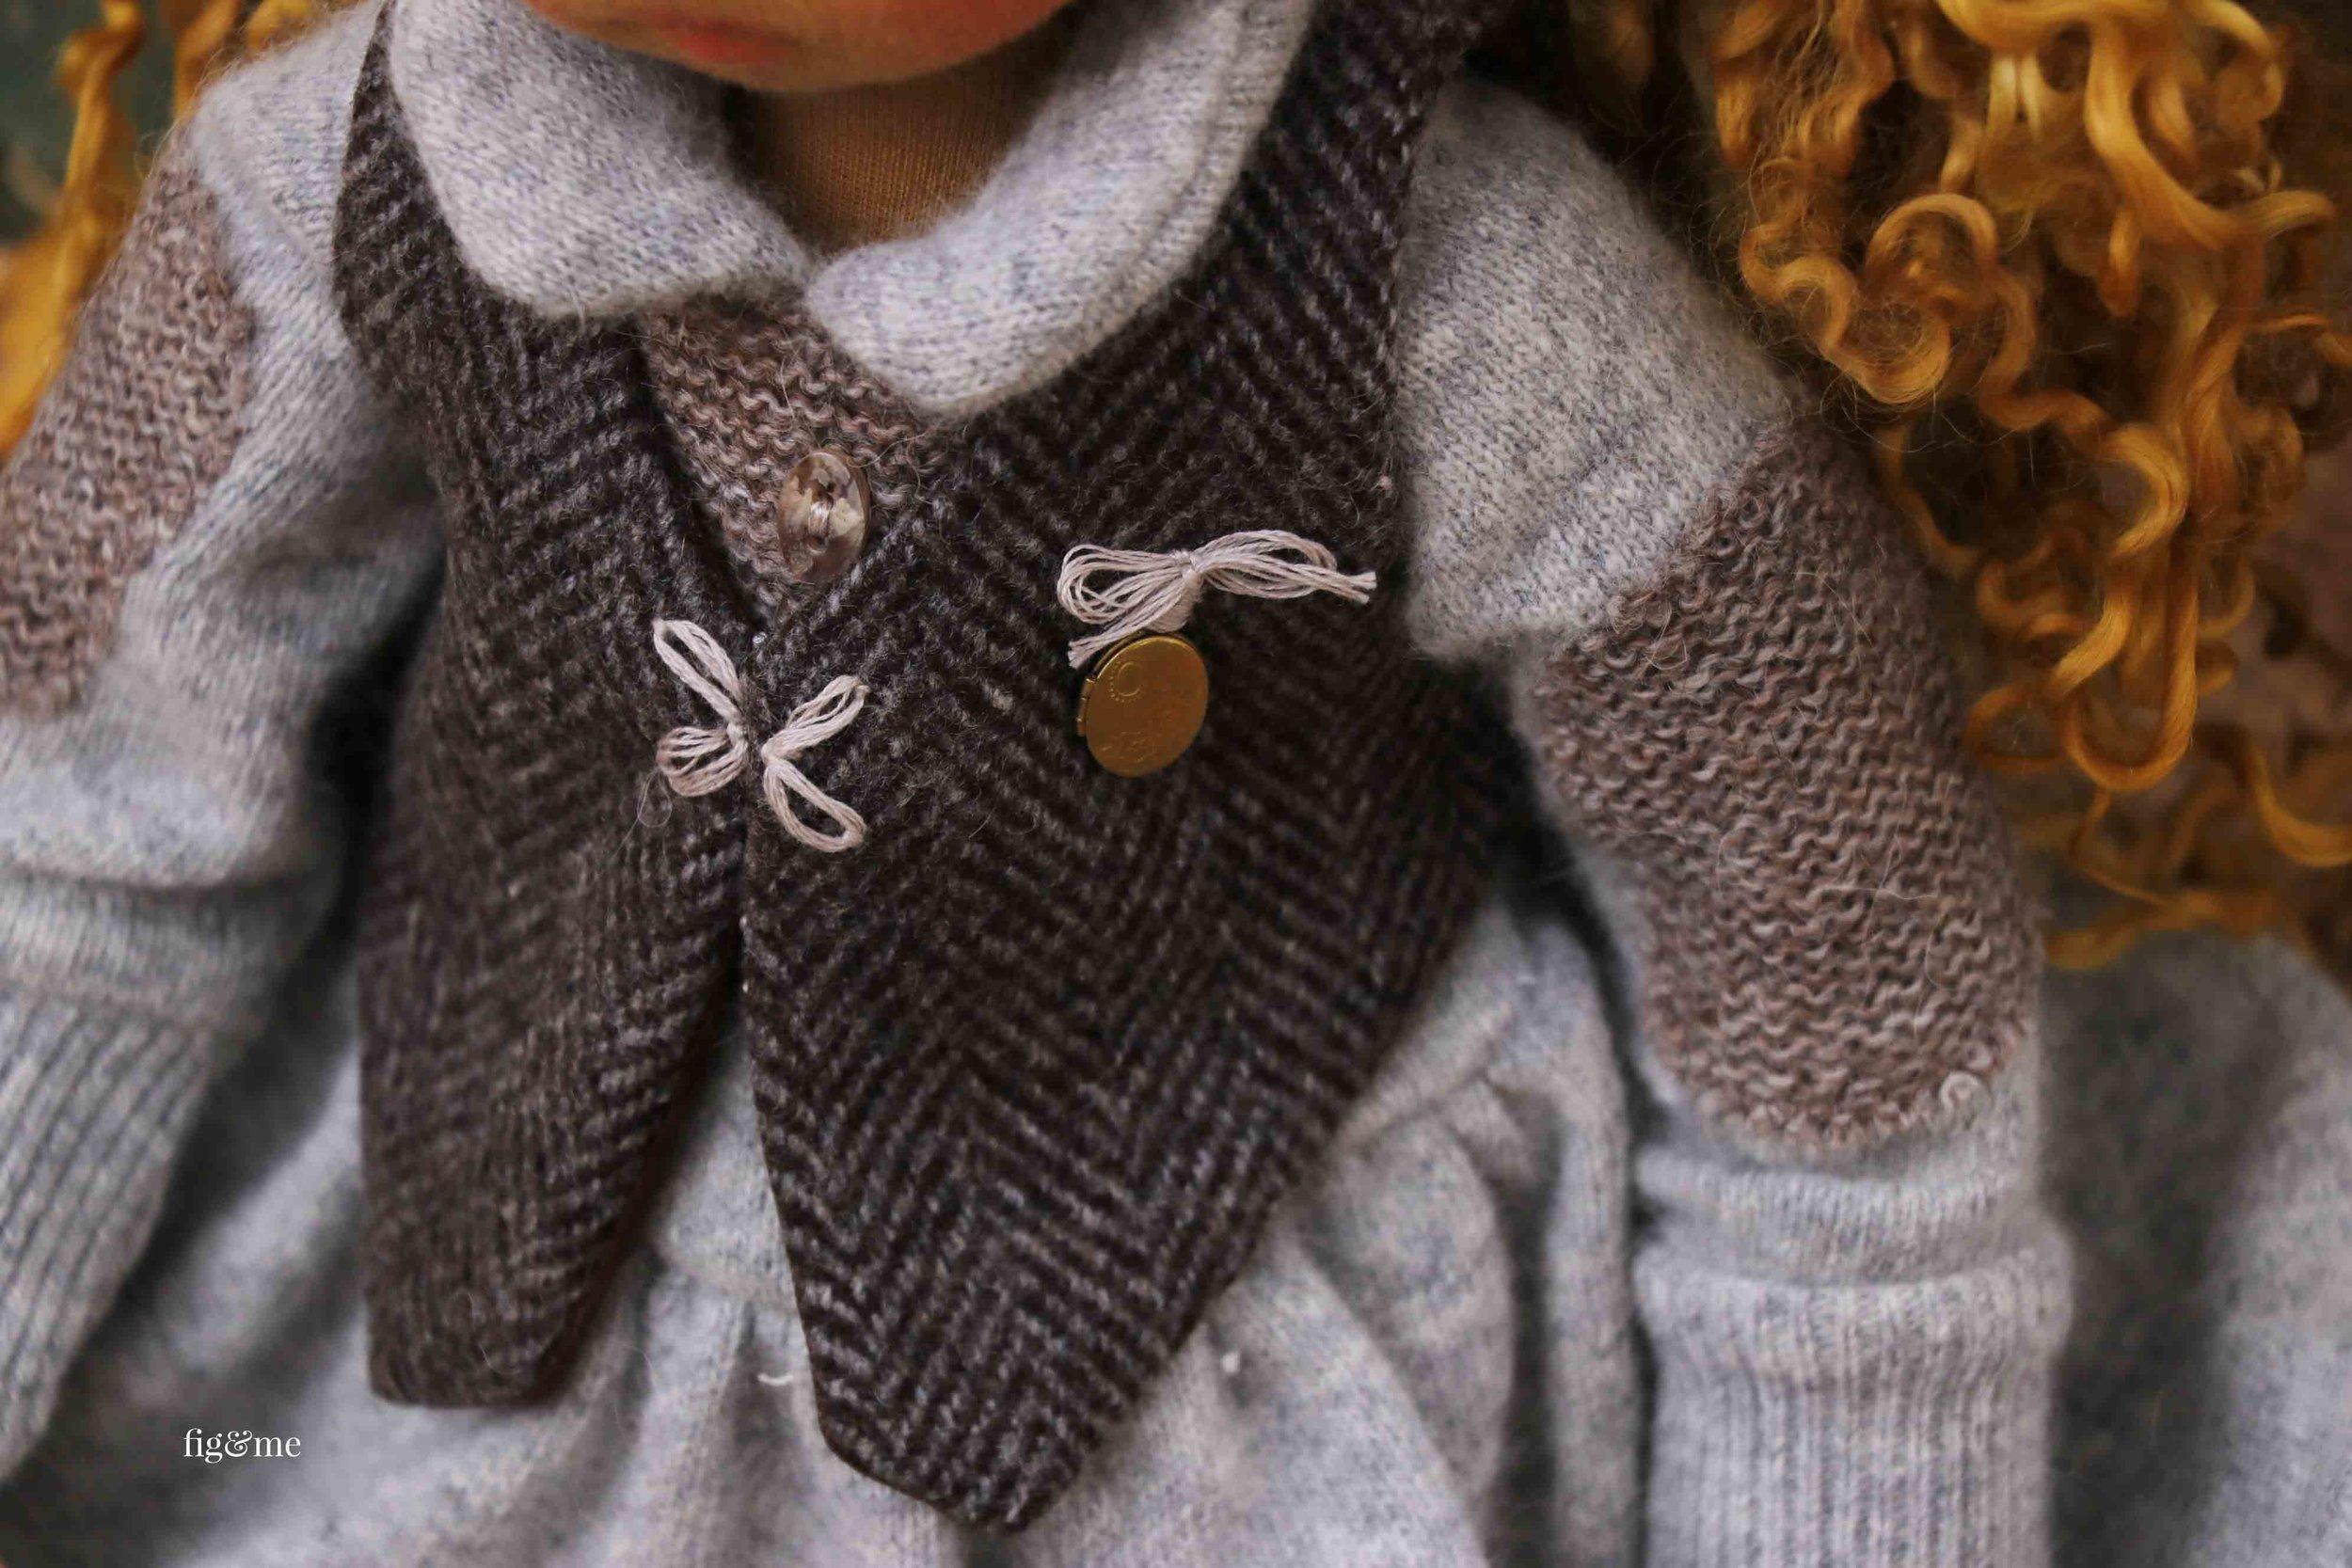 doll-clothing-details.jpg